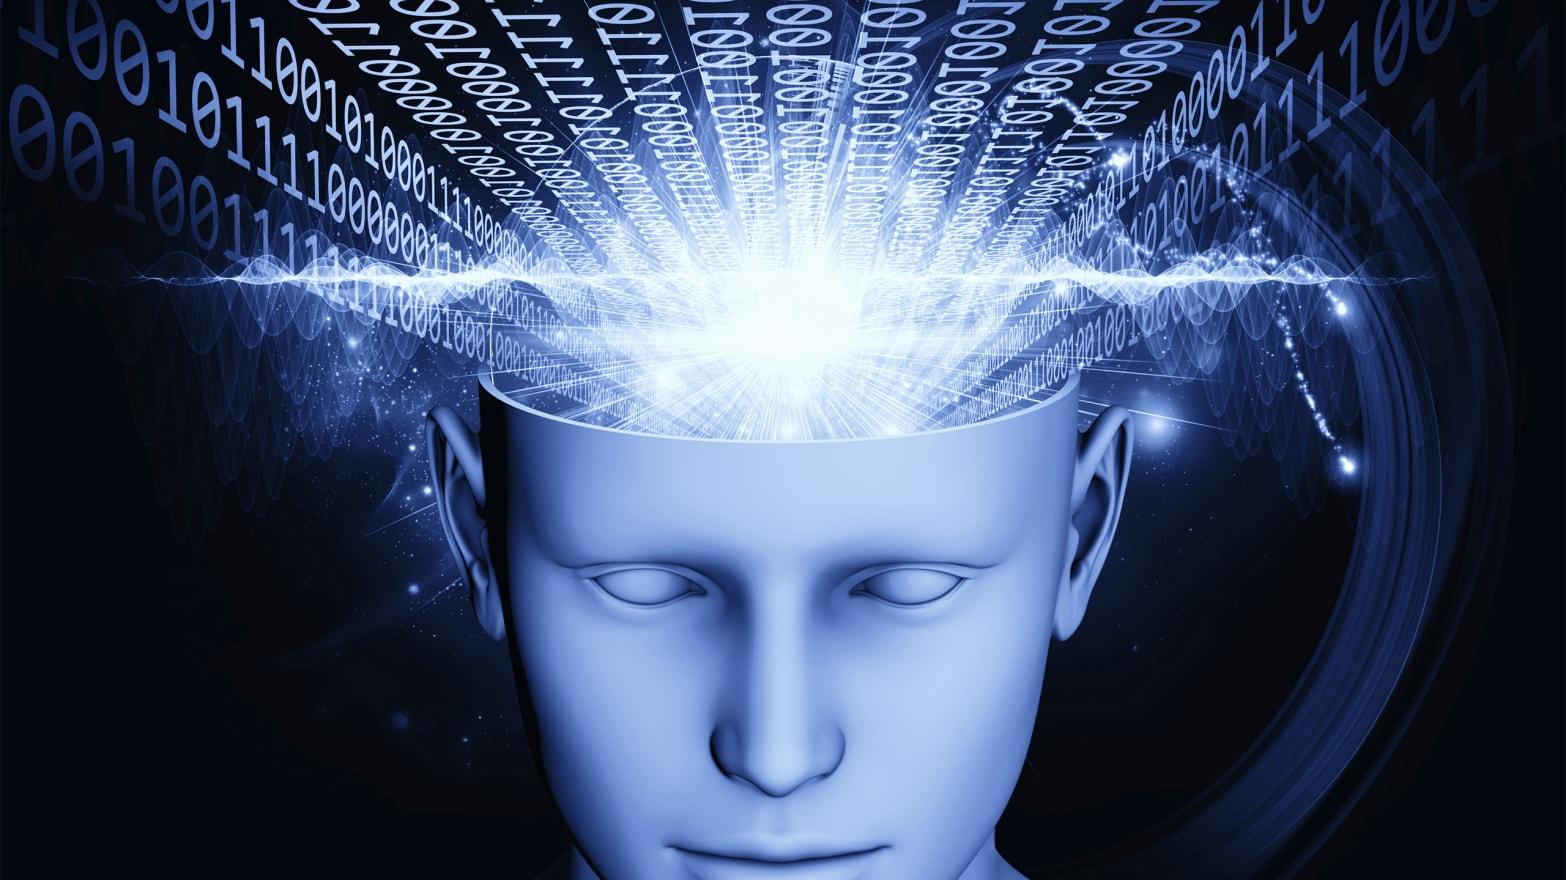 How to Mathematically Measure Consciousness